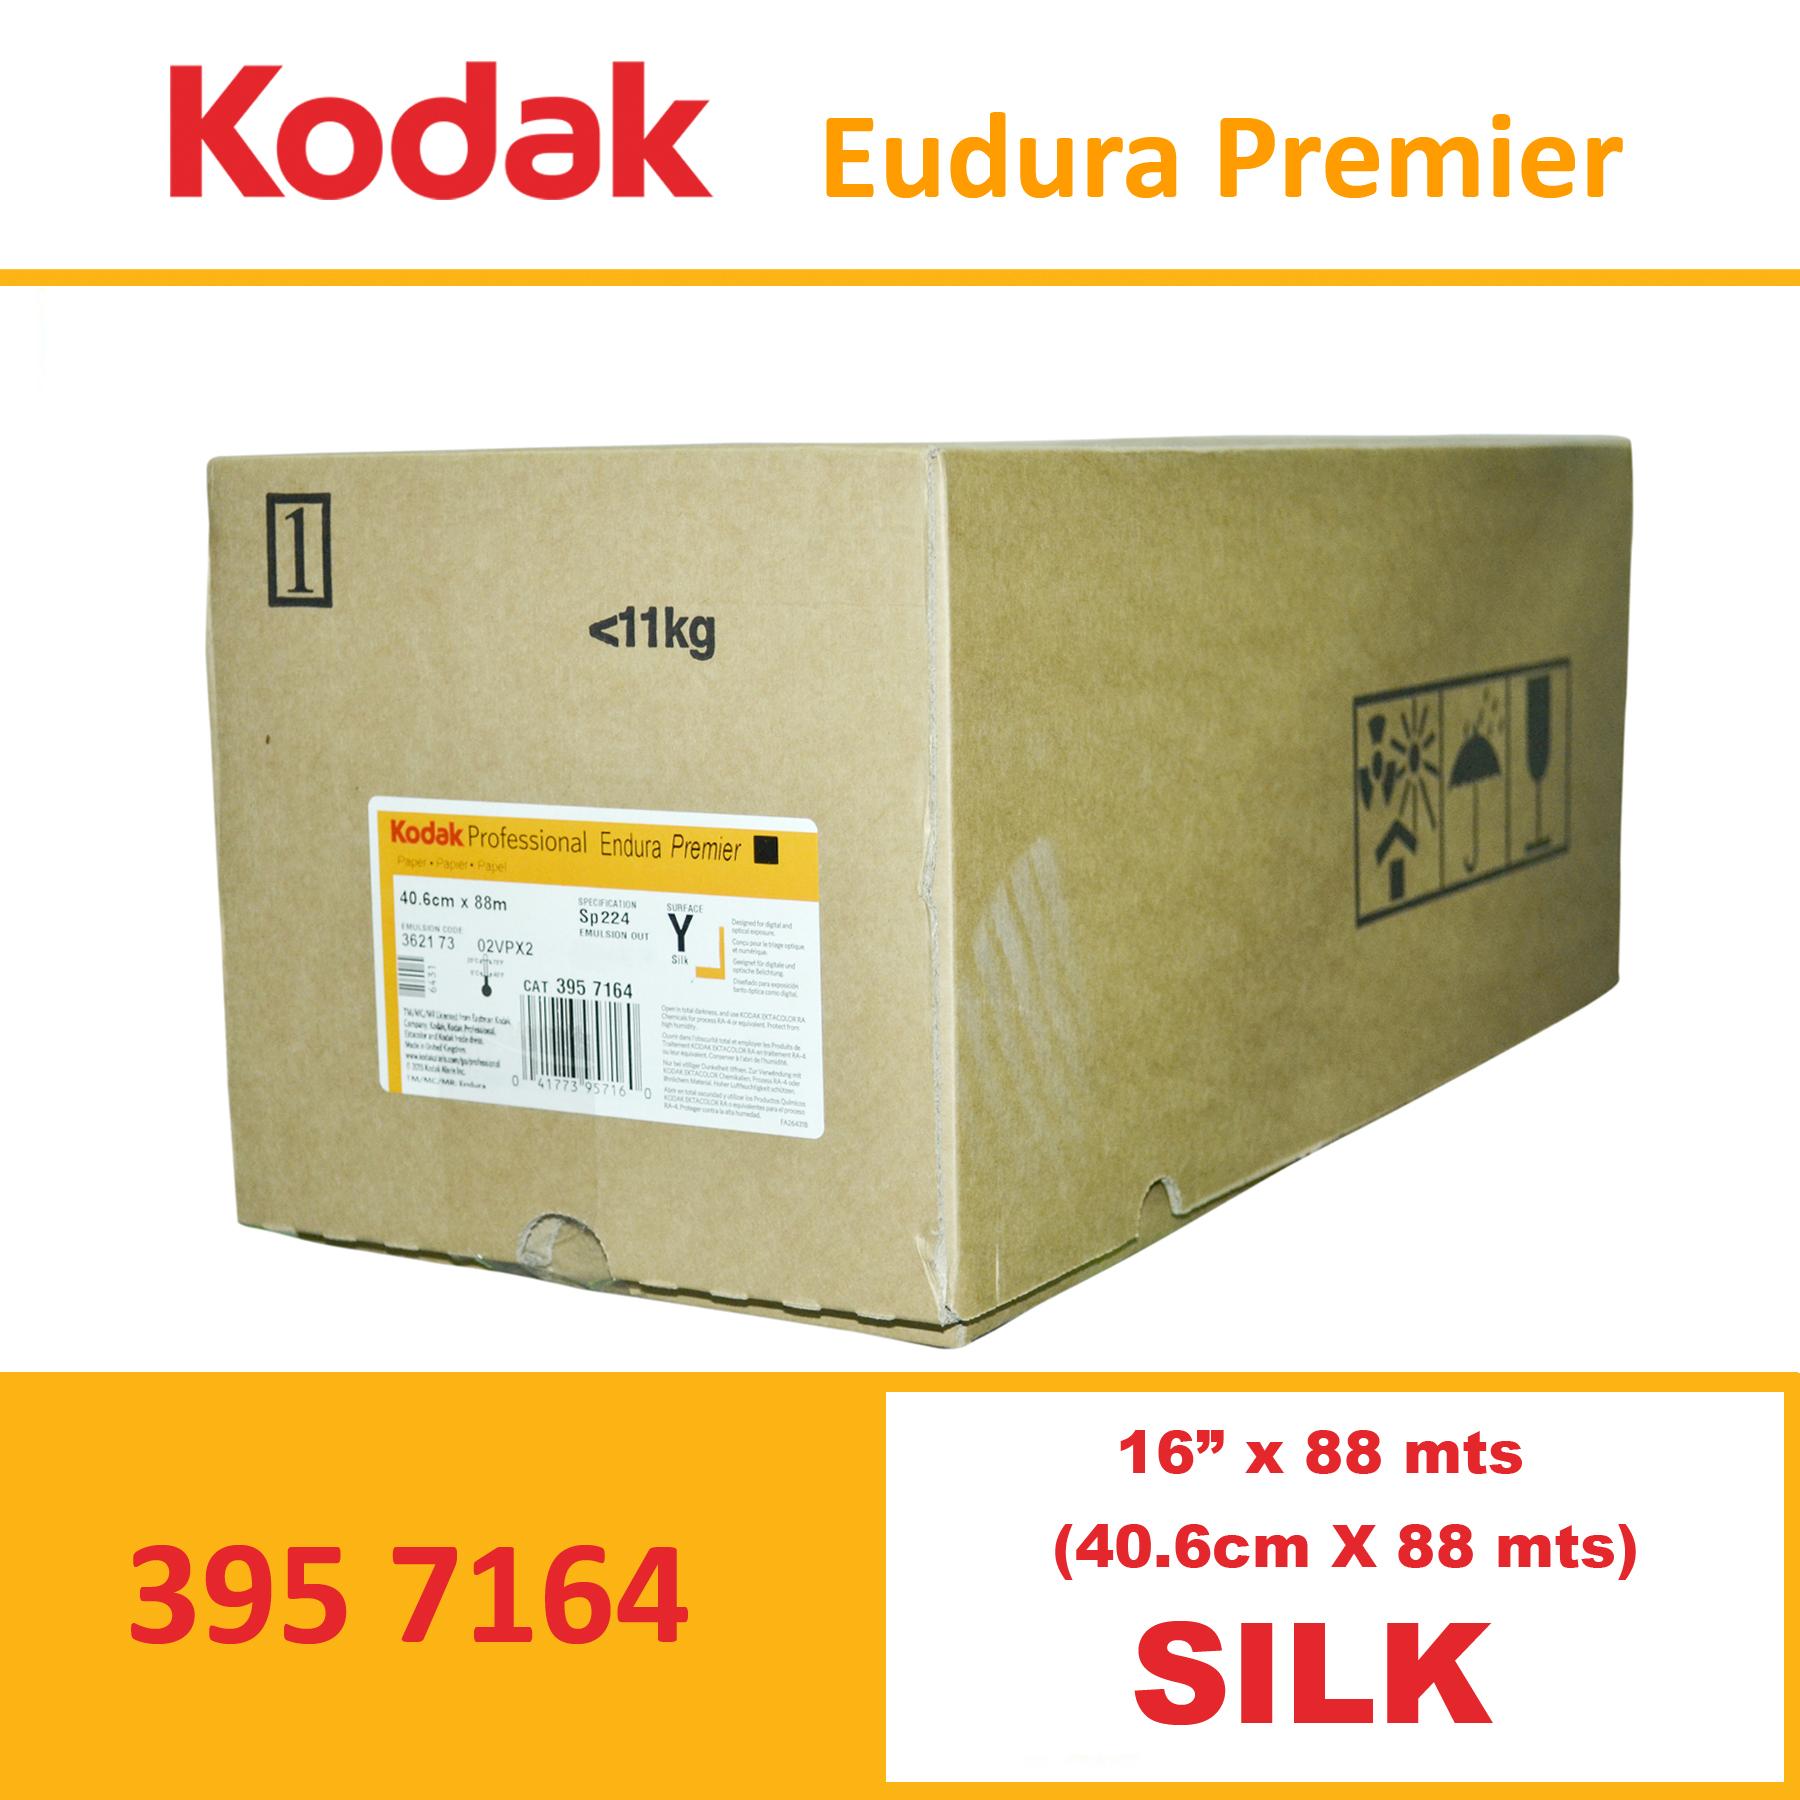 "Kodak 16"" Endura Professional Premier Silk"